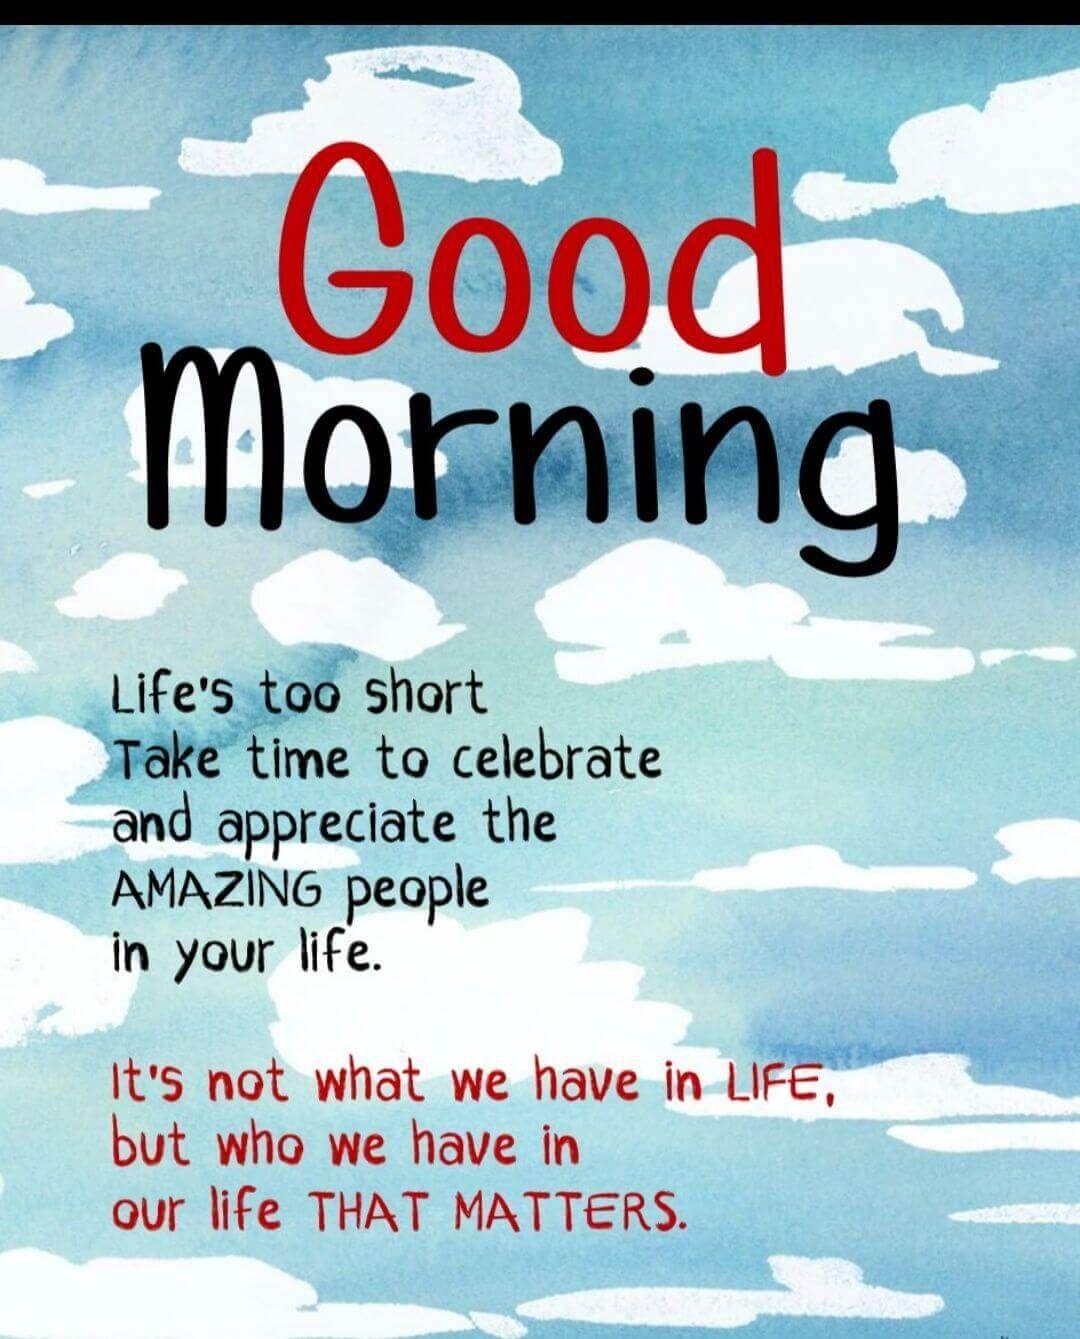 Good Morning Uplifting Quotes Twitter thumbnail